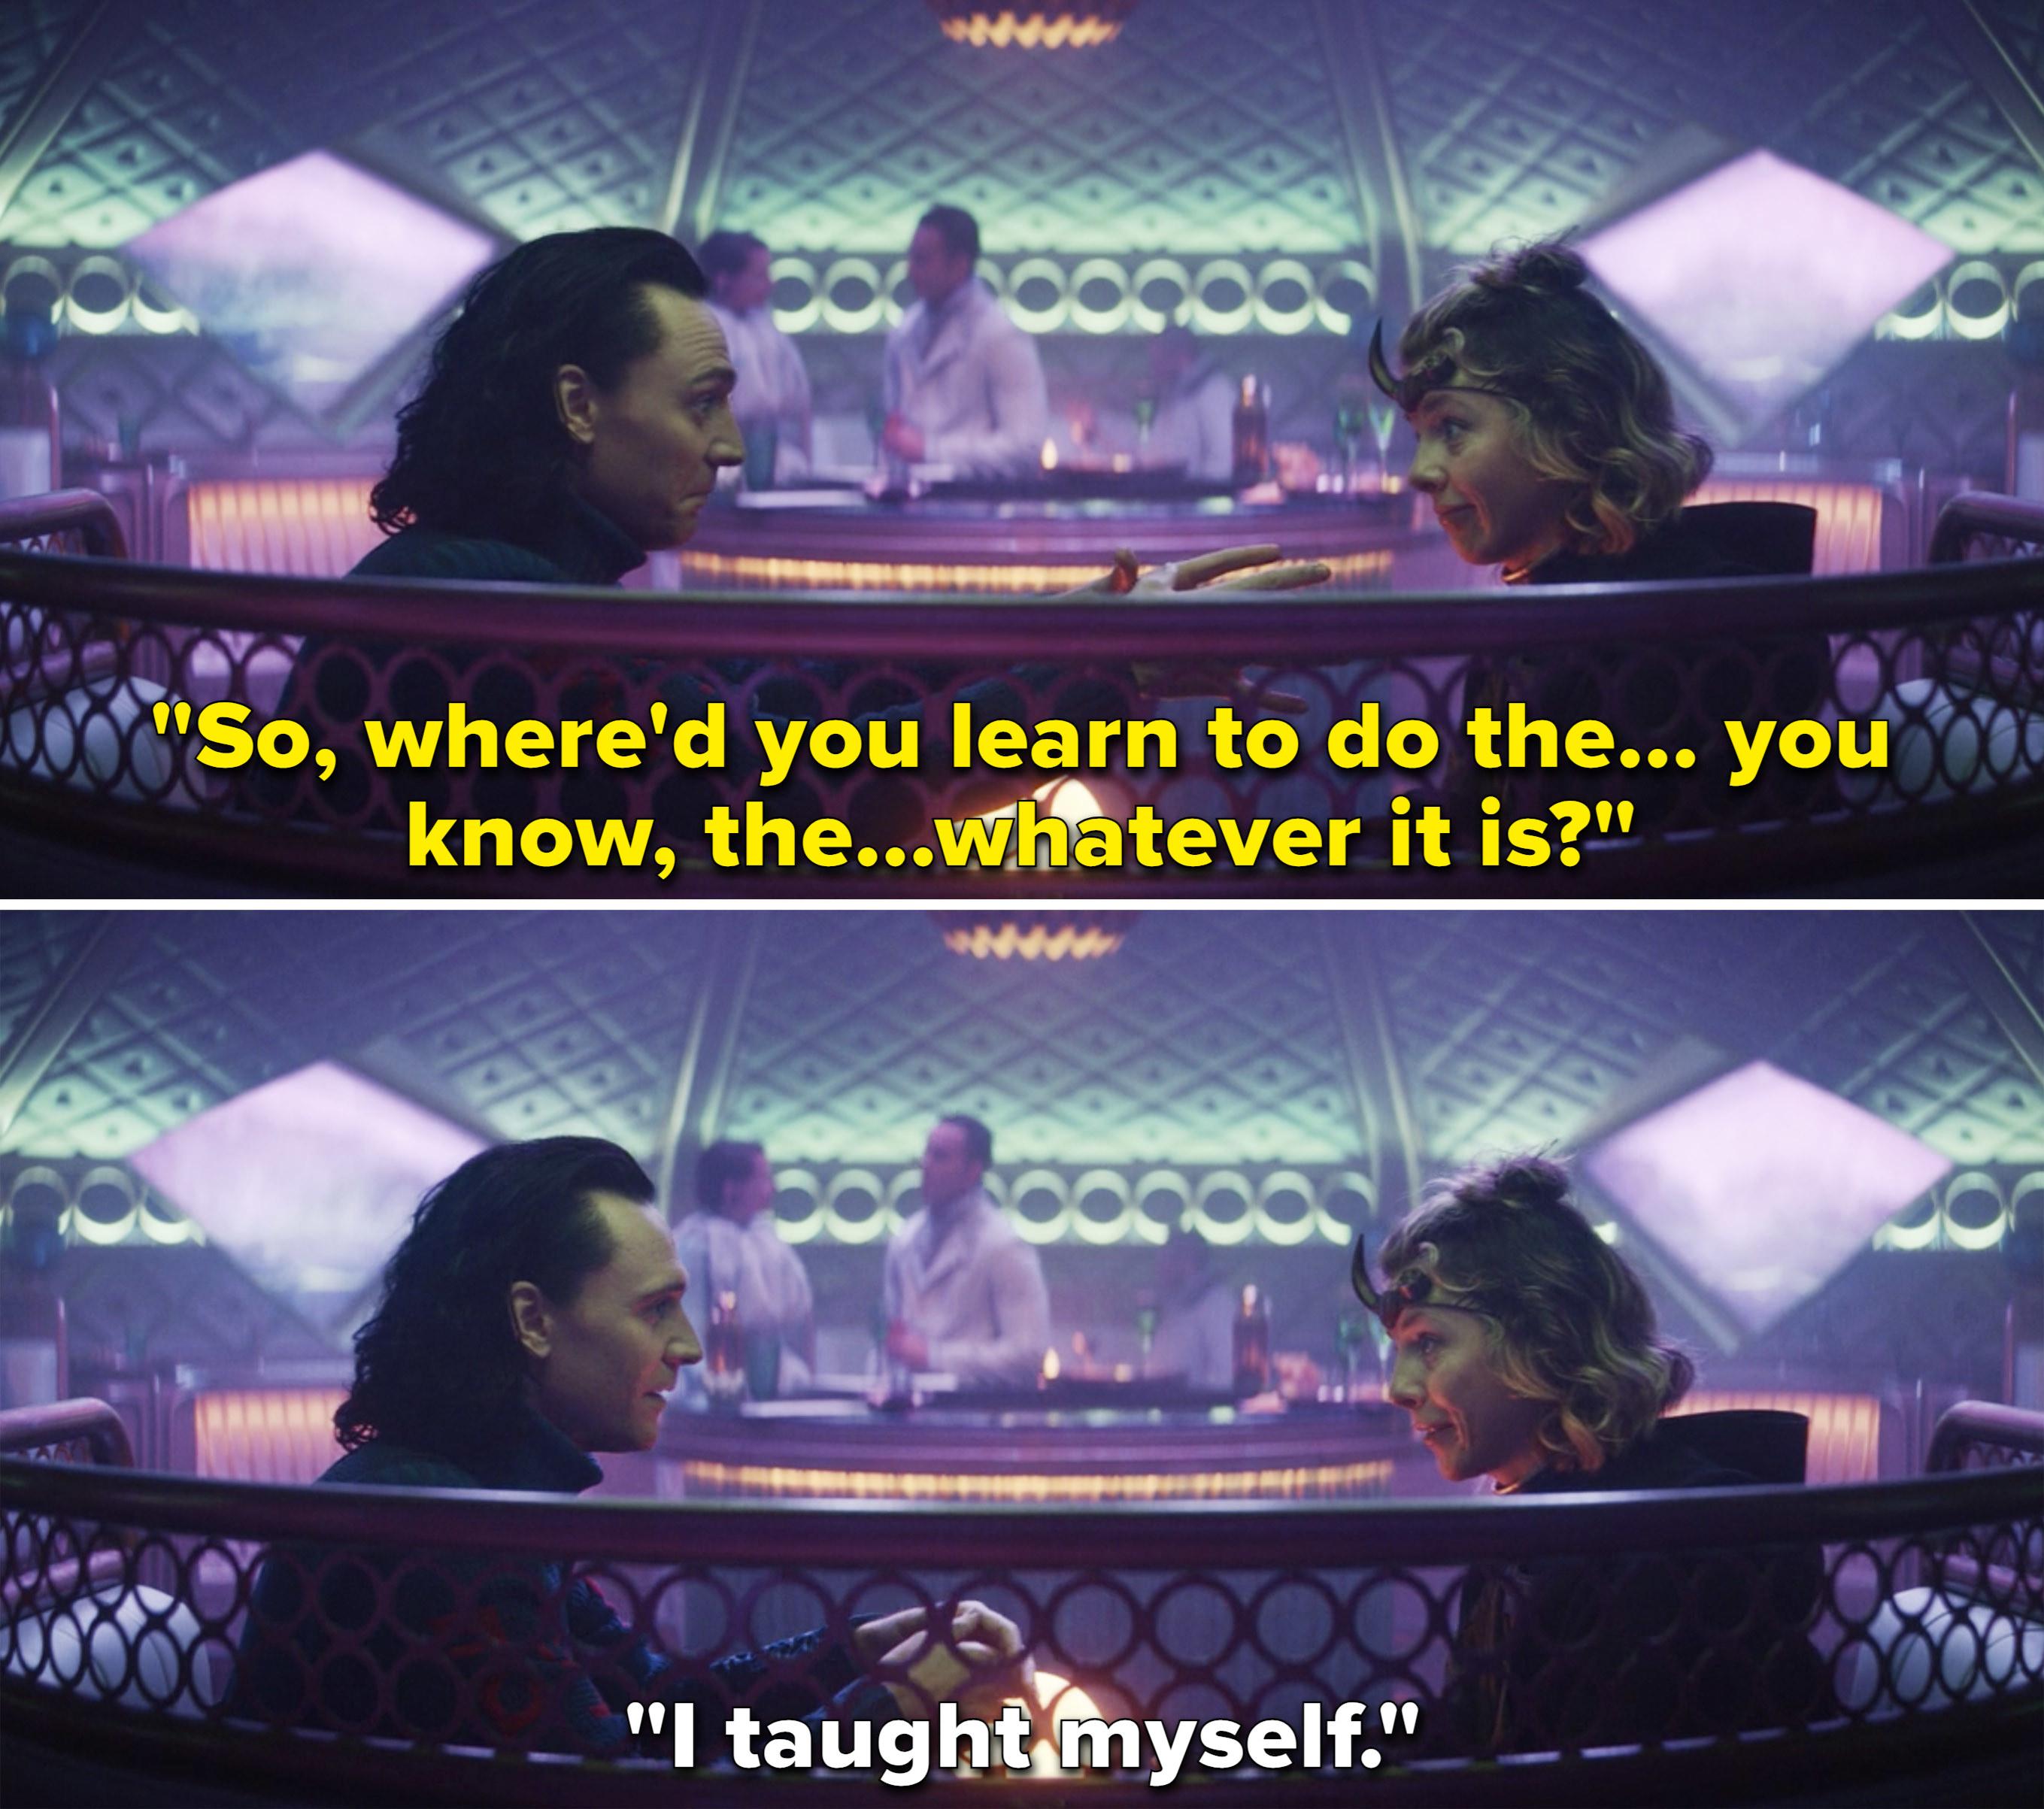 Sylvie tells Loki she taught herself to mind control